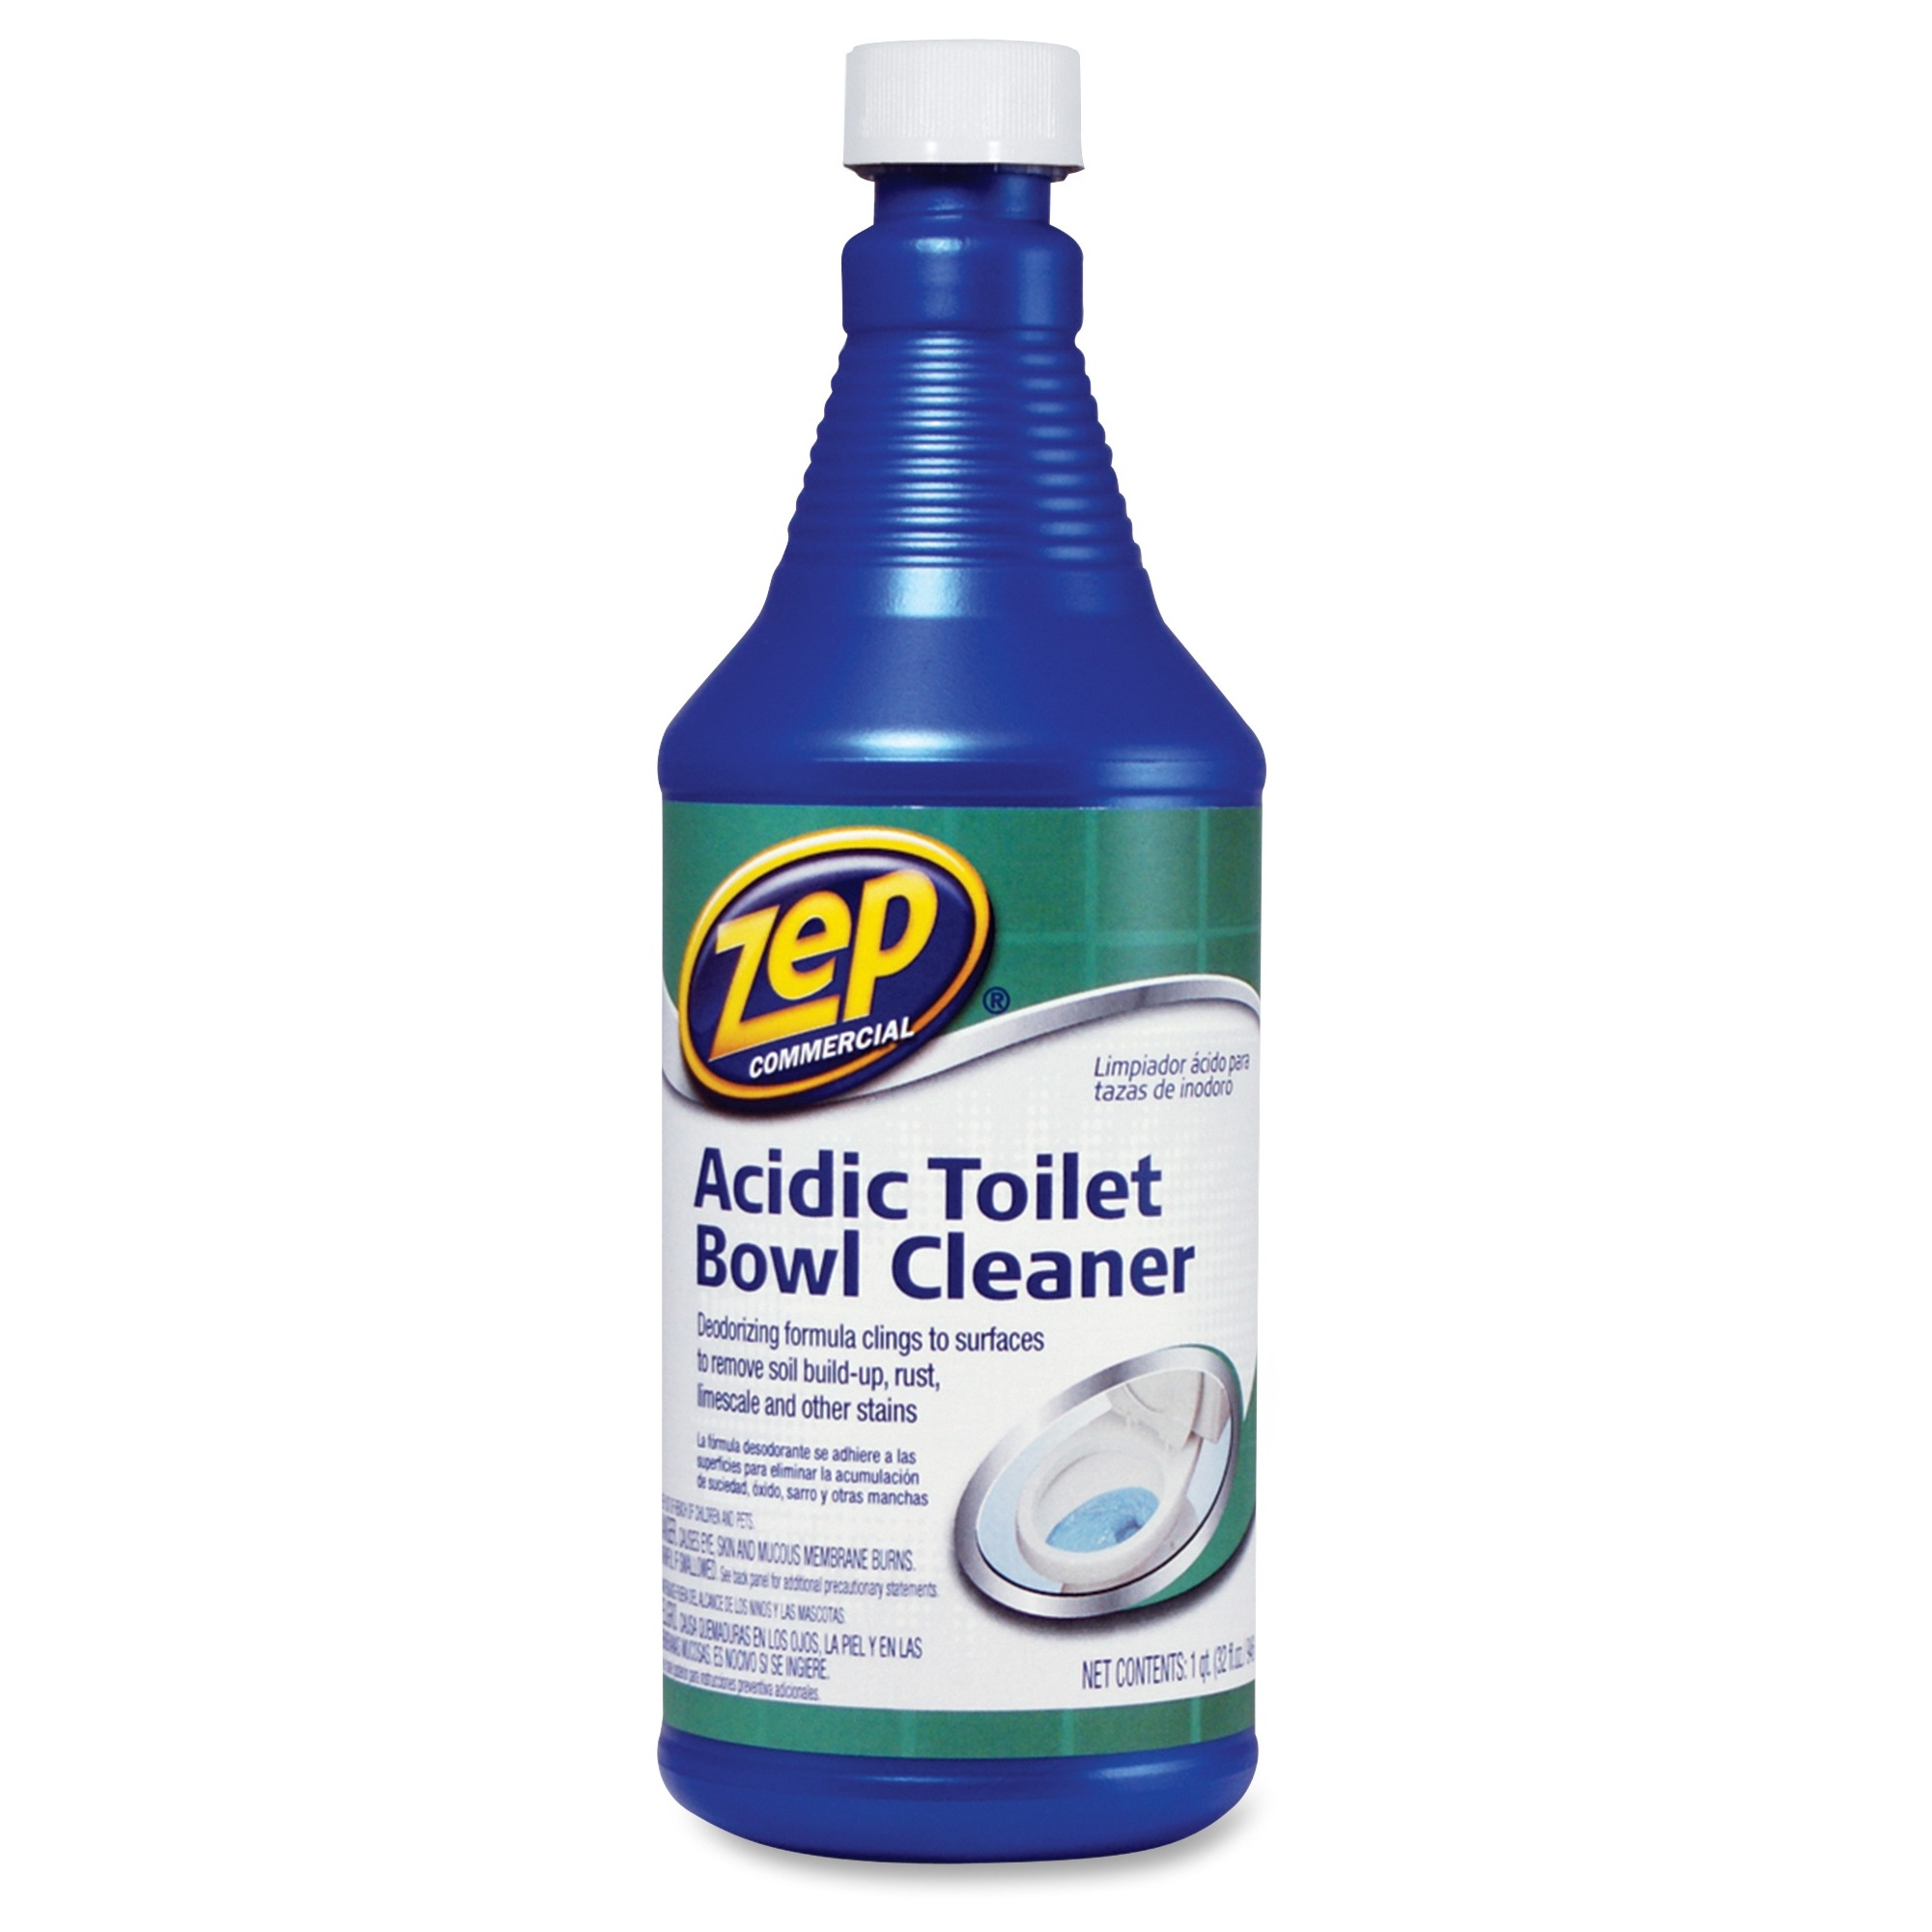 Zep Commercial Acidic Toilet Bowl Cleaner - 0.25 Gal [32 Fl Oz] - Fresh Minty Pine Scent - 12 / Carton - Blue (zuatb32ct)